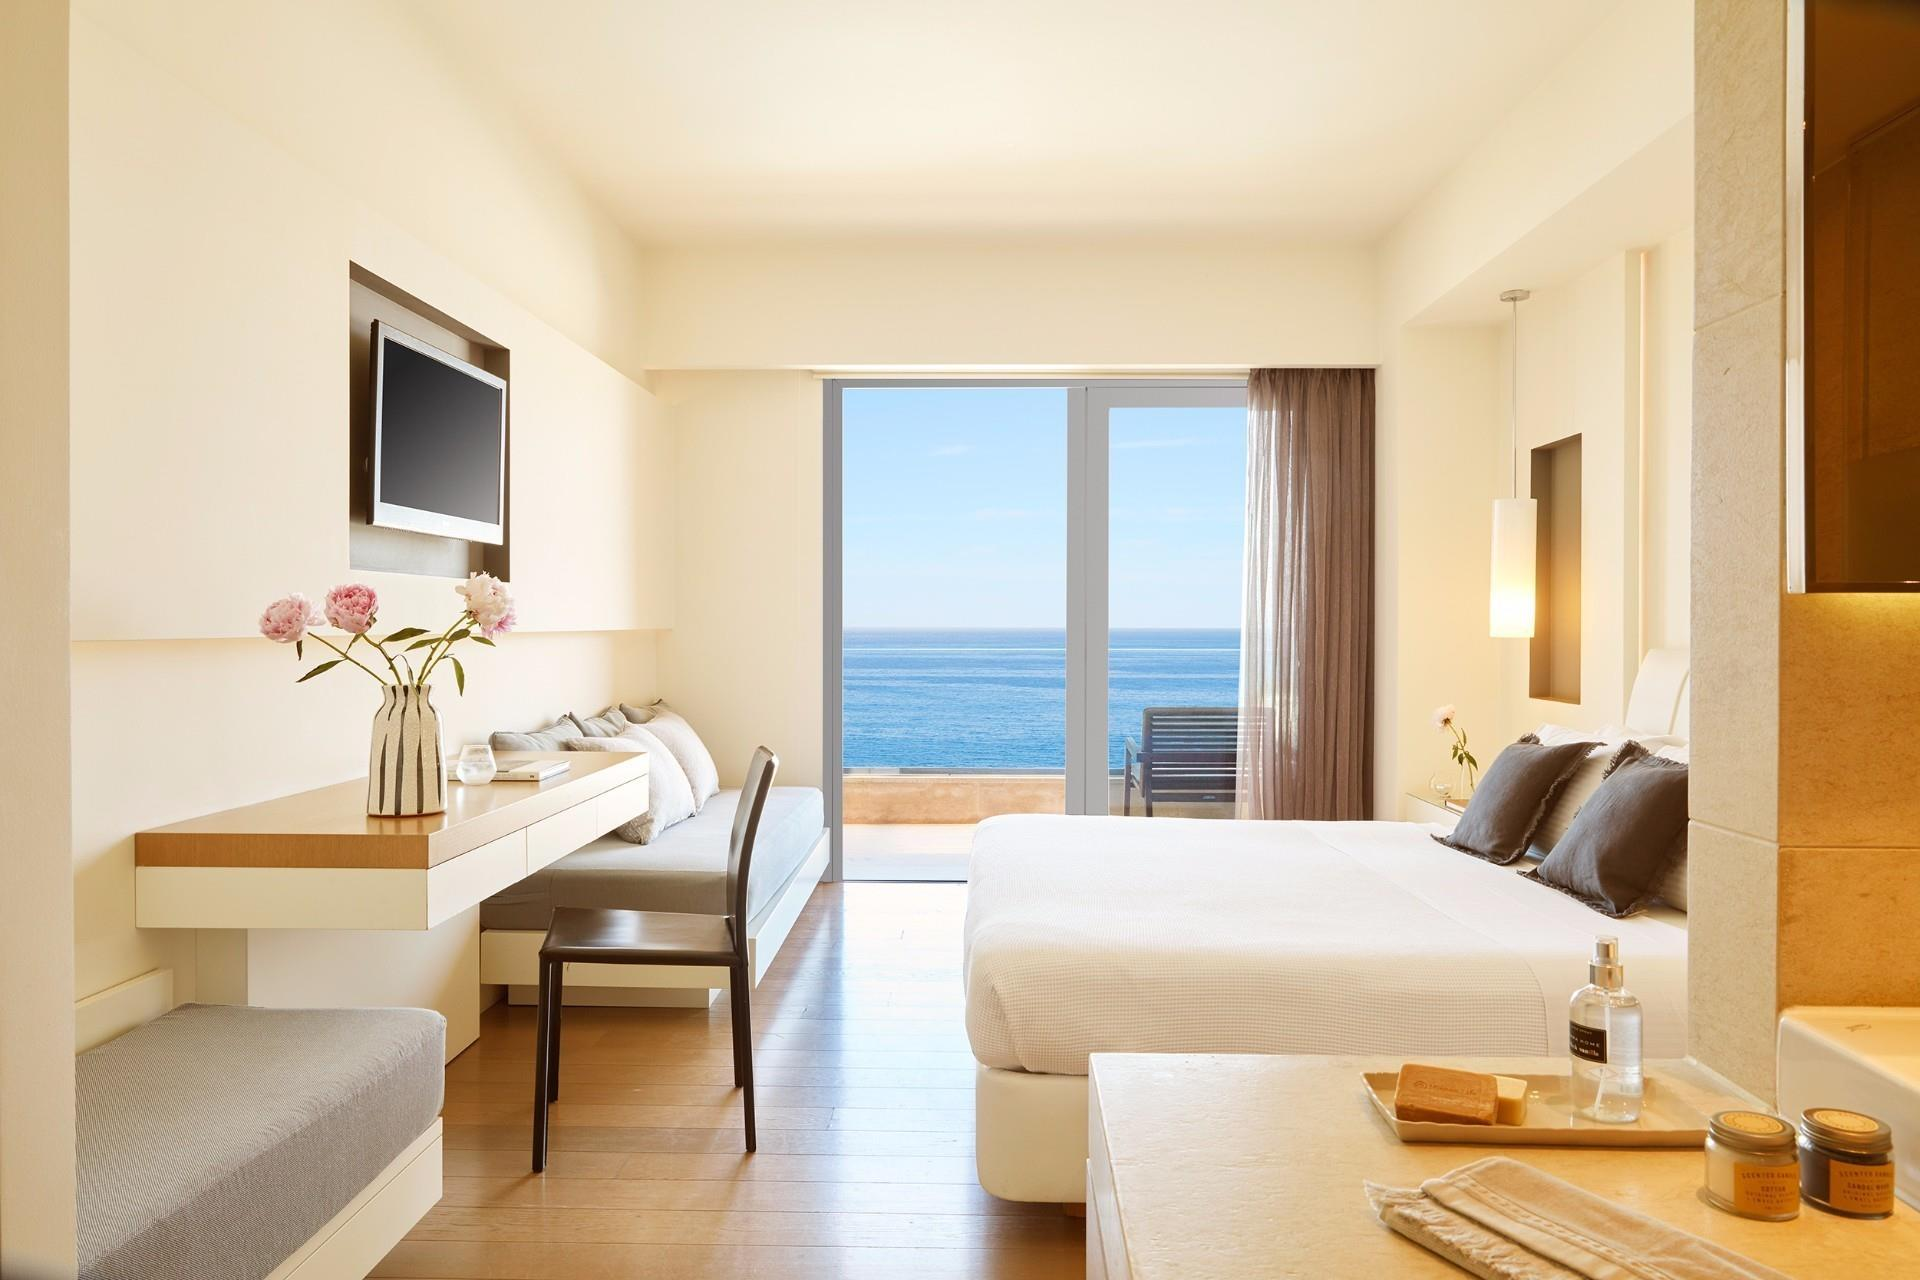 cavo-olympo-luxury-hotel-spa-genel-0010